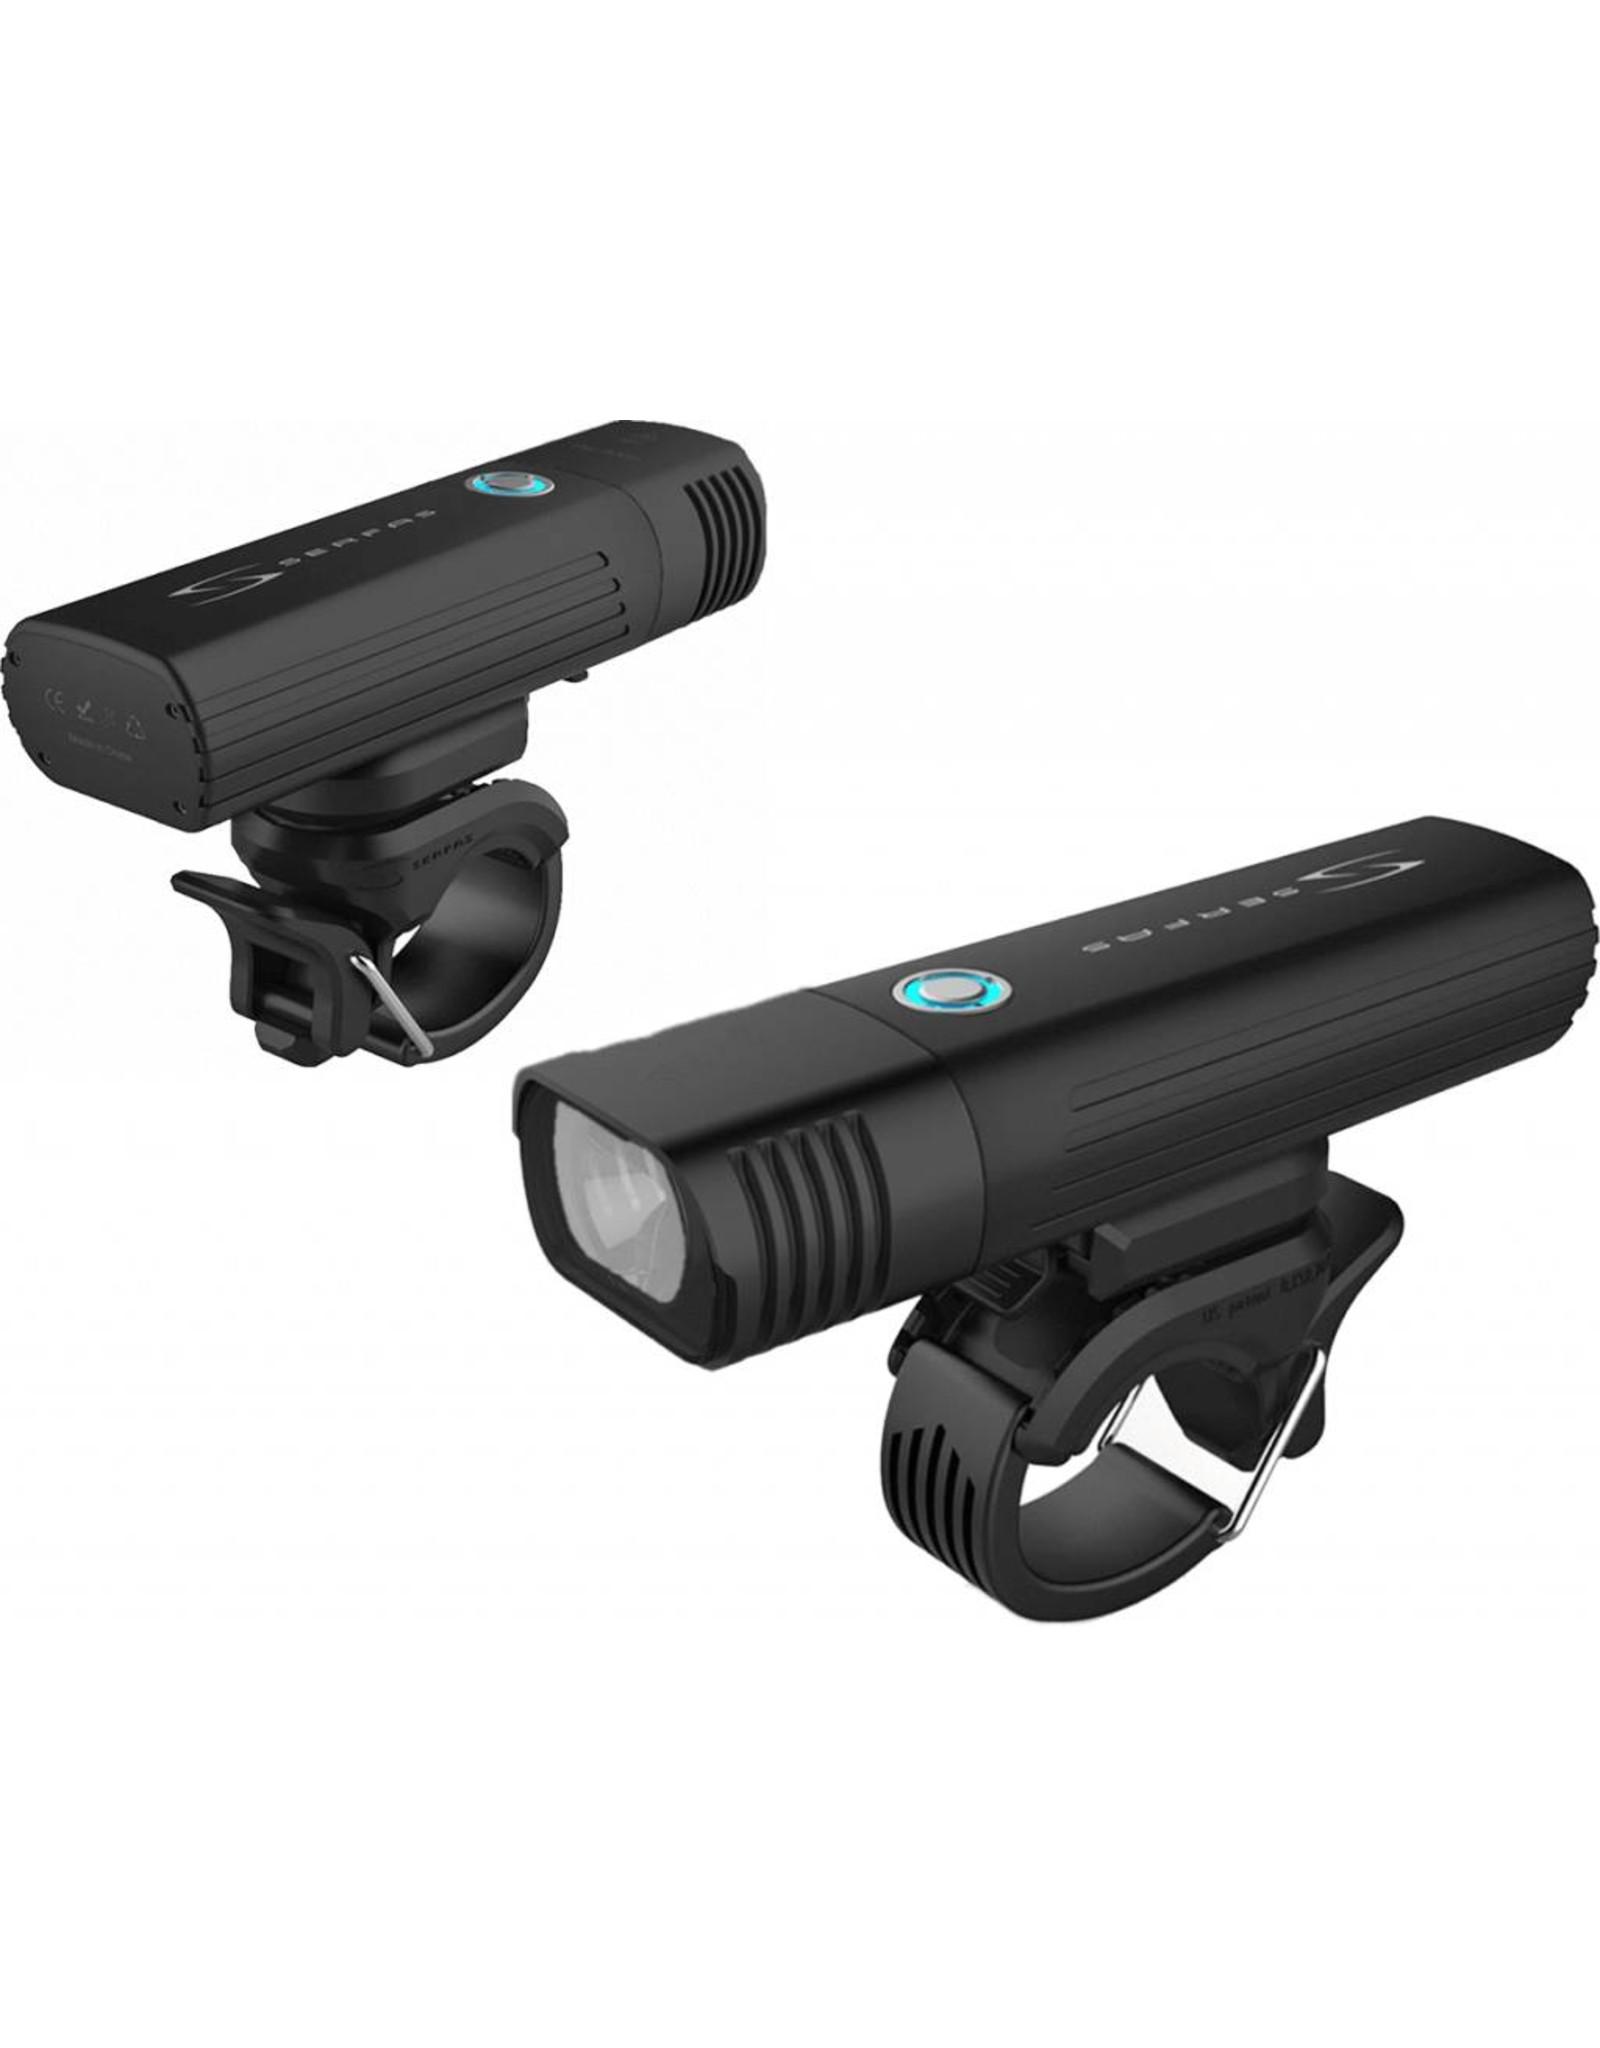 Serfas E-Lume 650 Headlight - USB